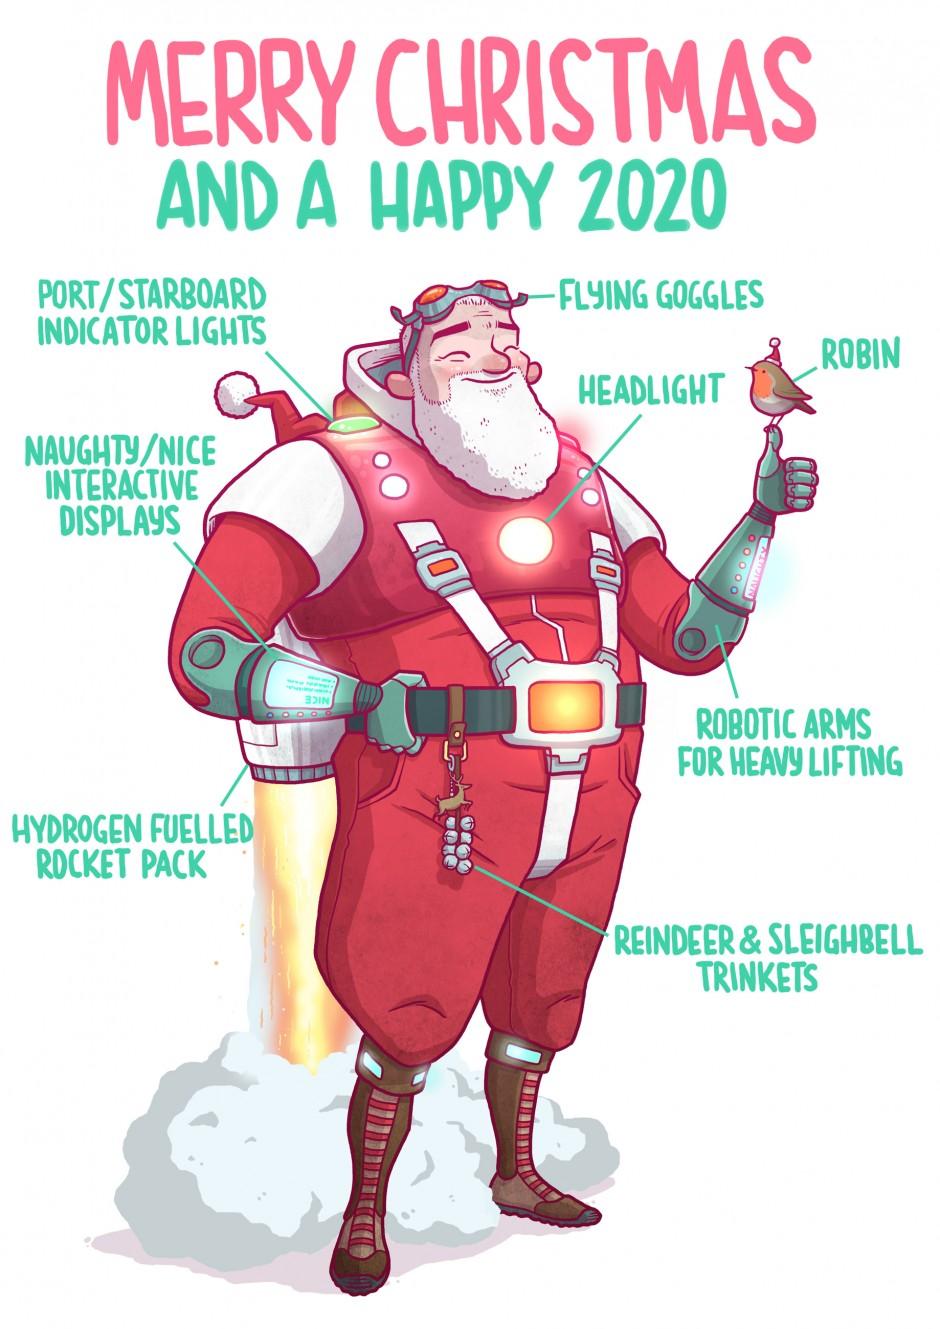 Future Santa